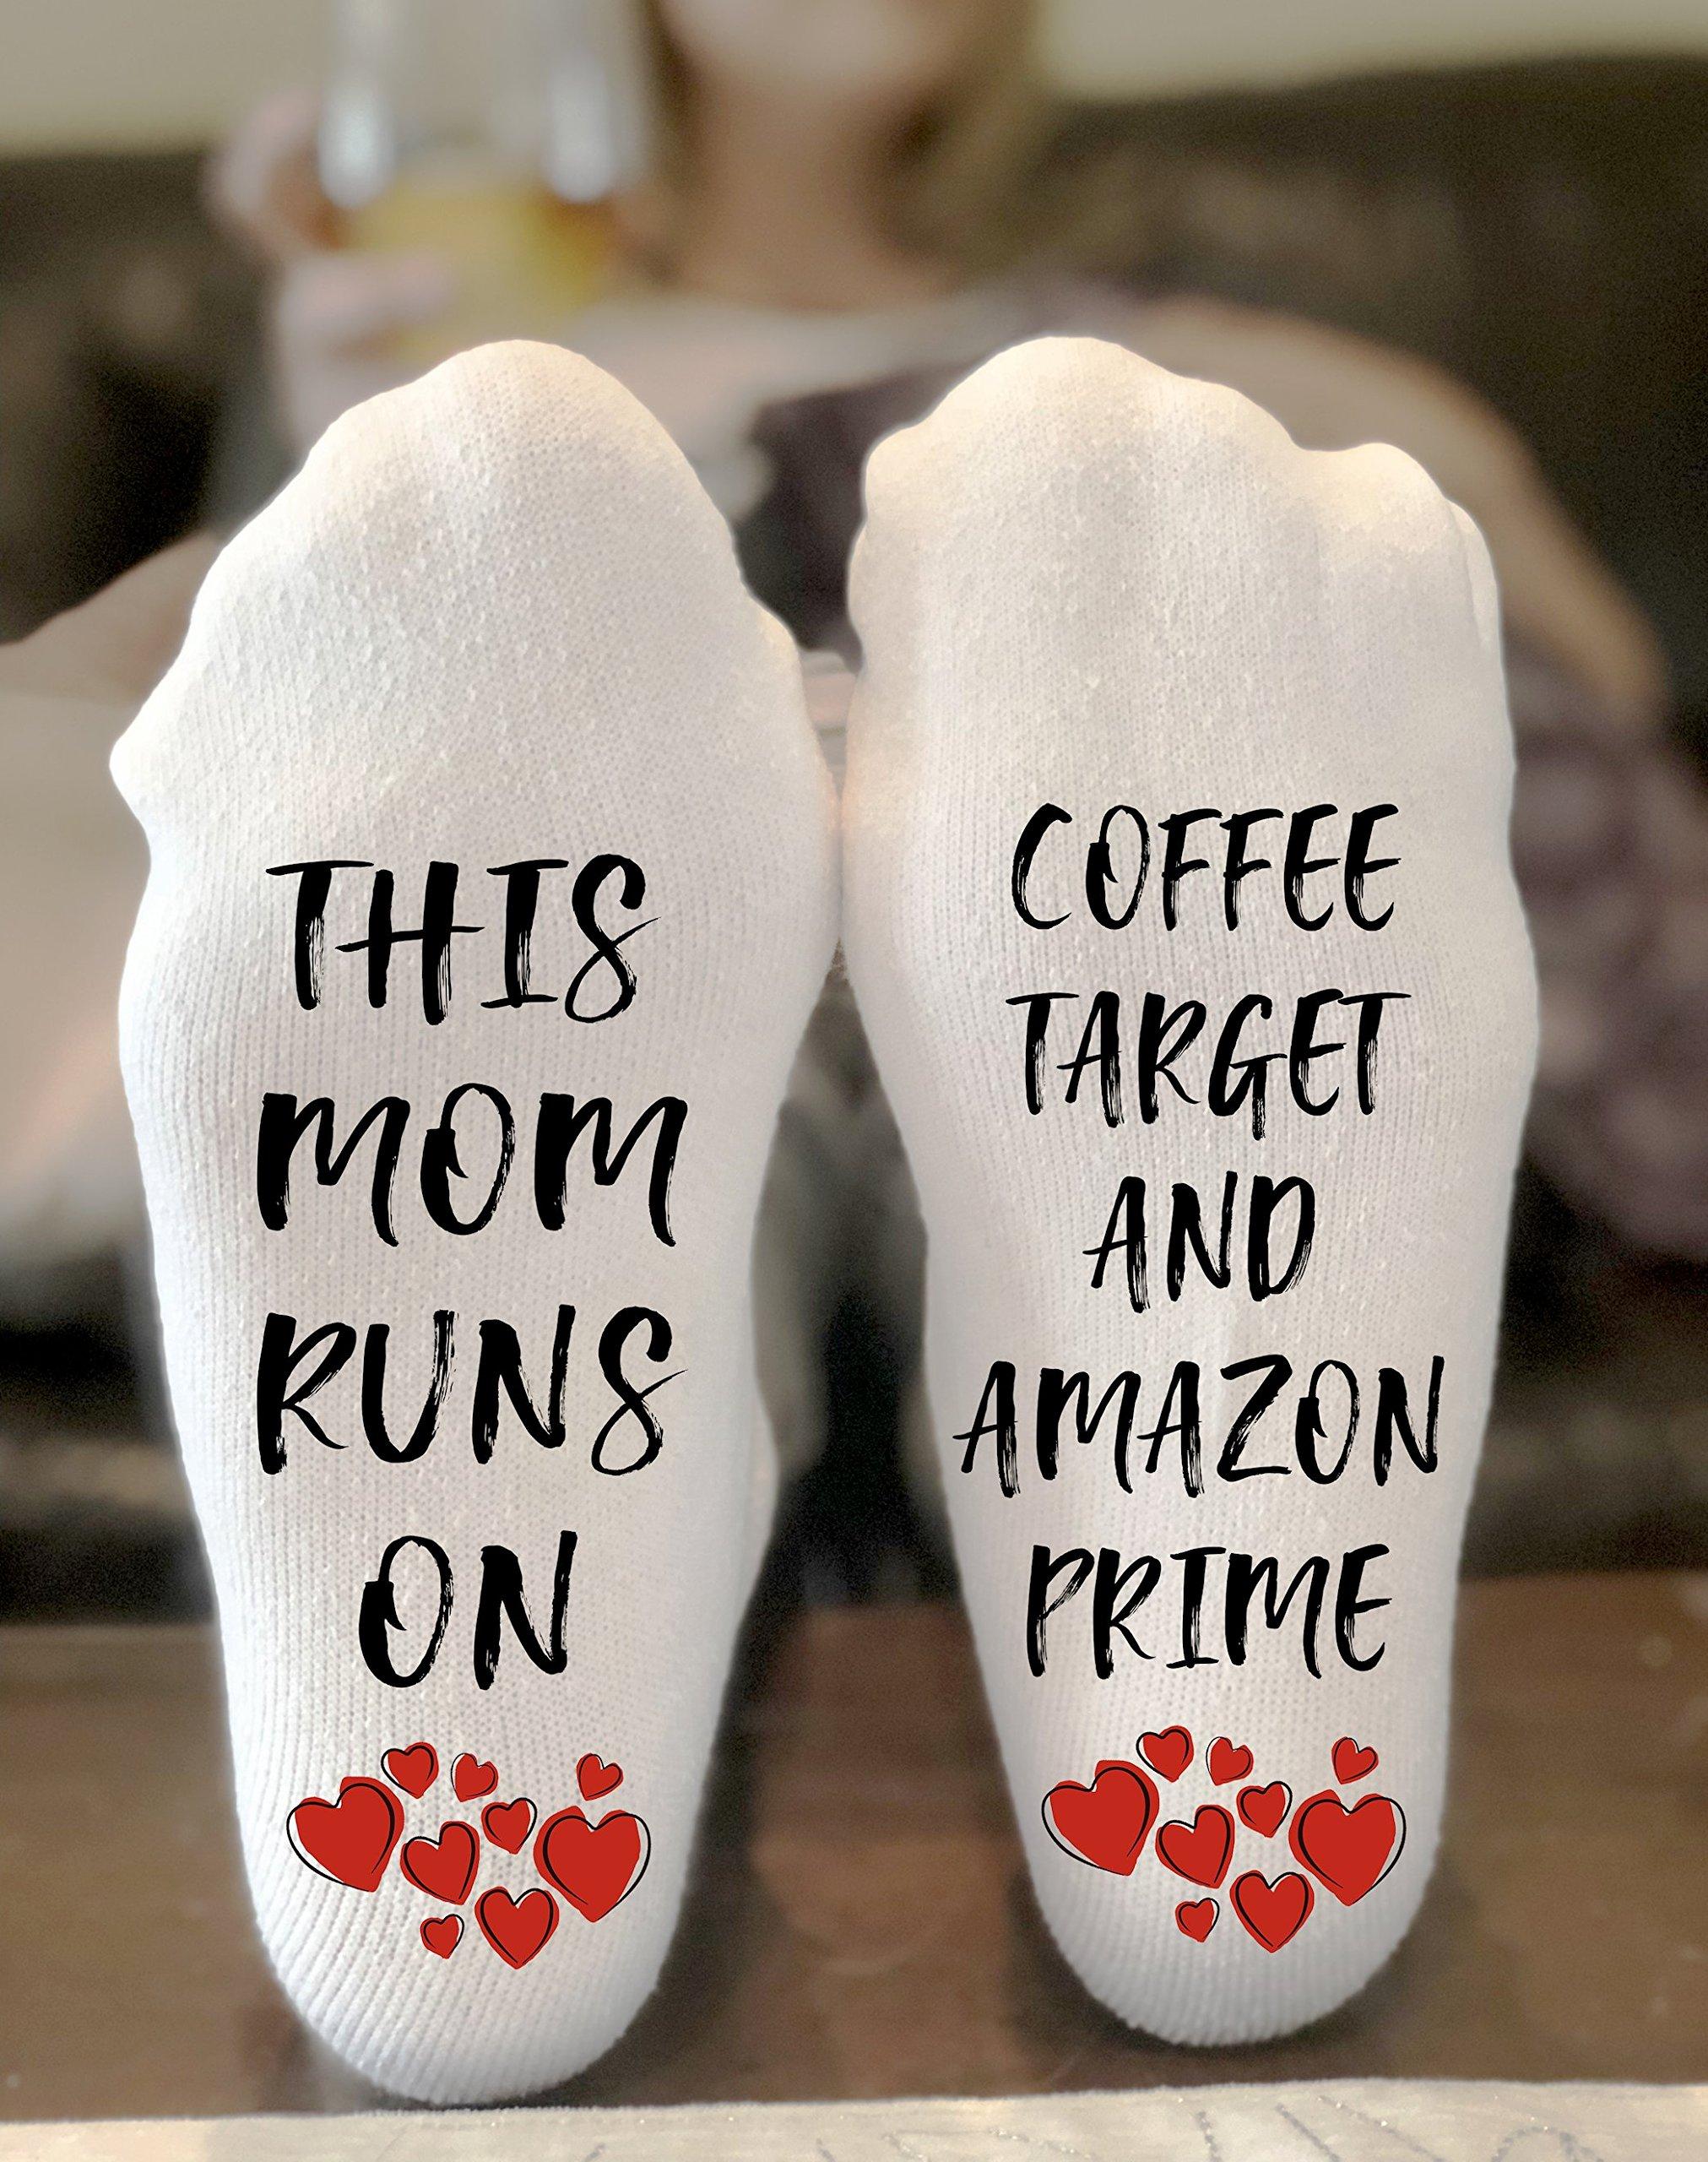 This Mom Runs On Coffee, Target and Amazon Prime Novelty Funky Crew Socks Men Women Christmas Gifts Cotton Slipper Socks